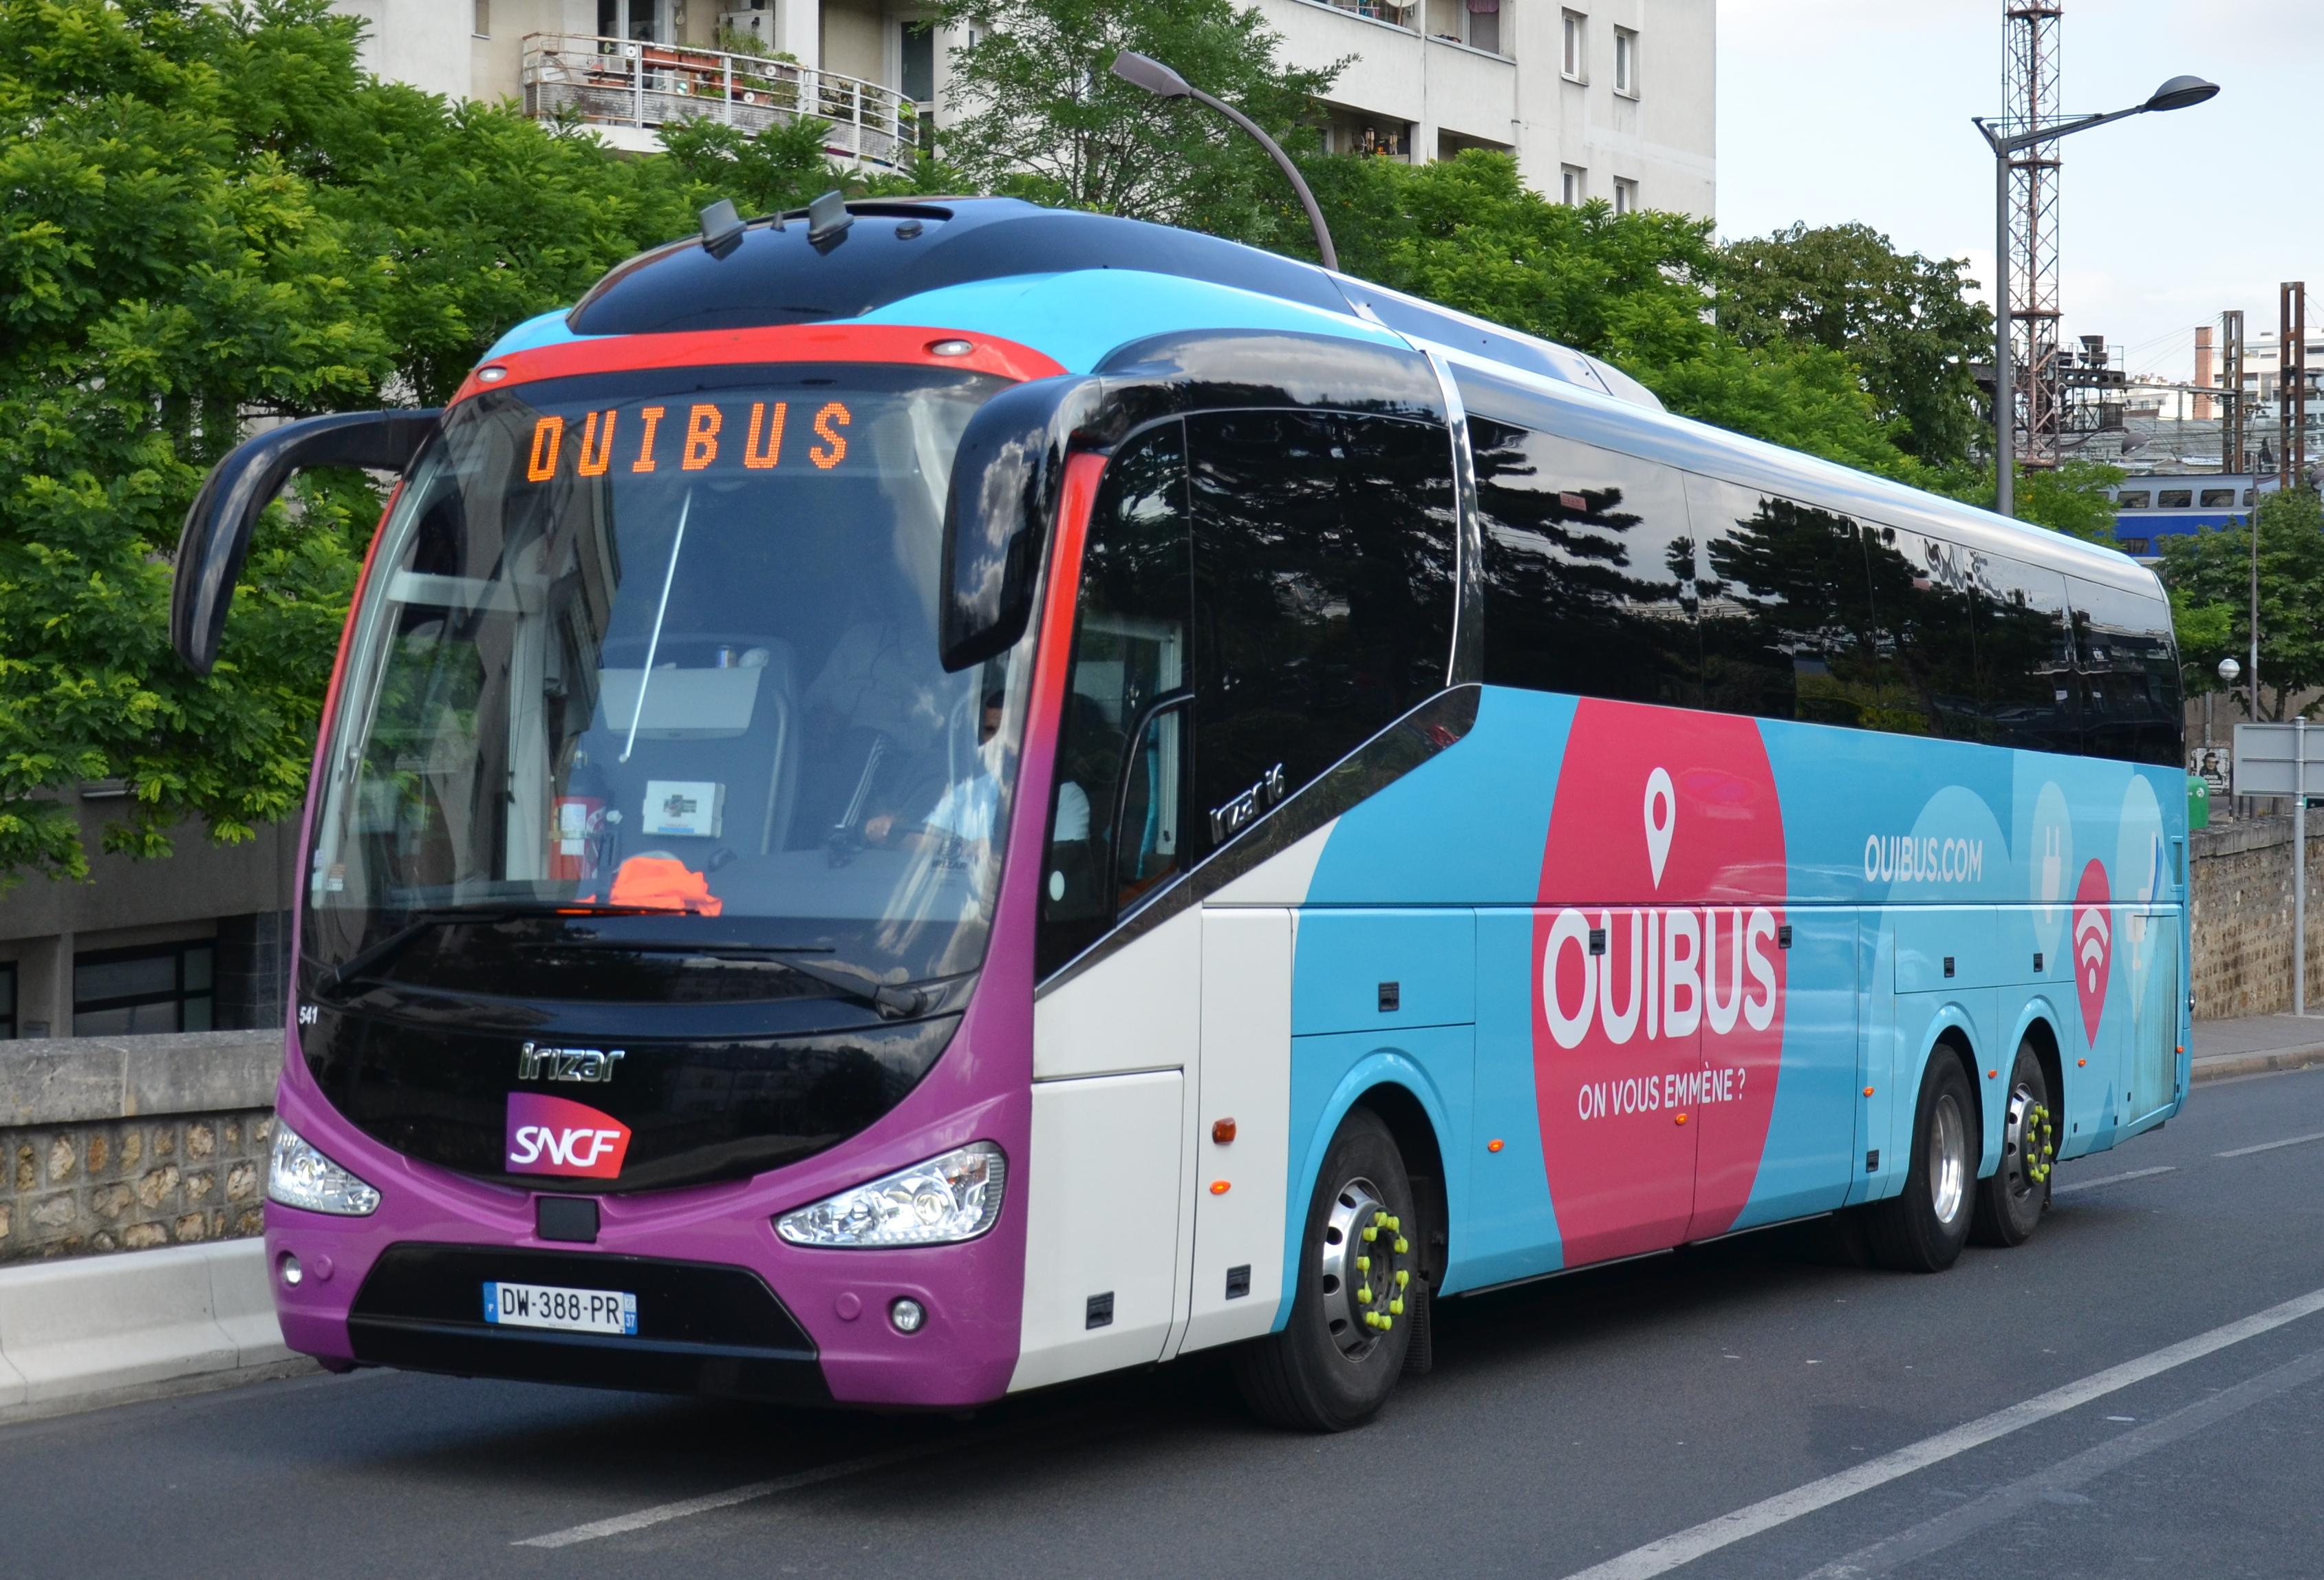 https://venturebeat.com/2018/11/12/blablacar-buys-french-bus-service-raises-114-million/